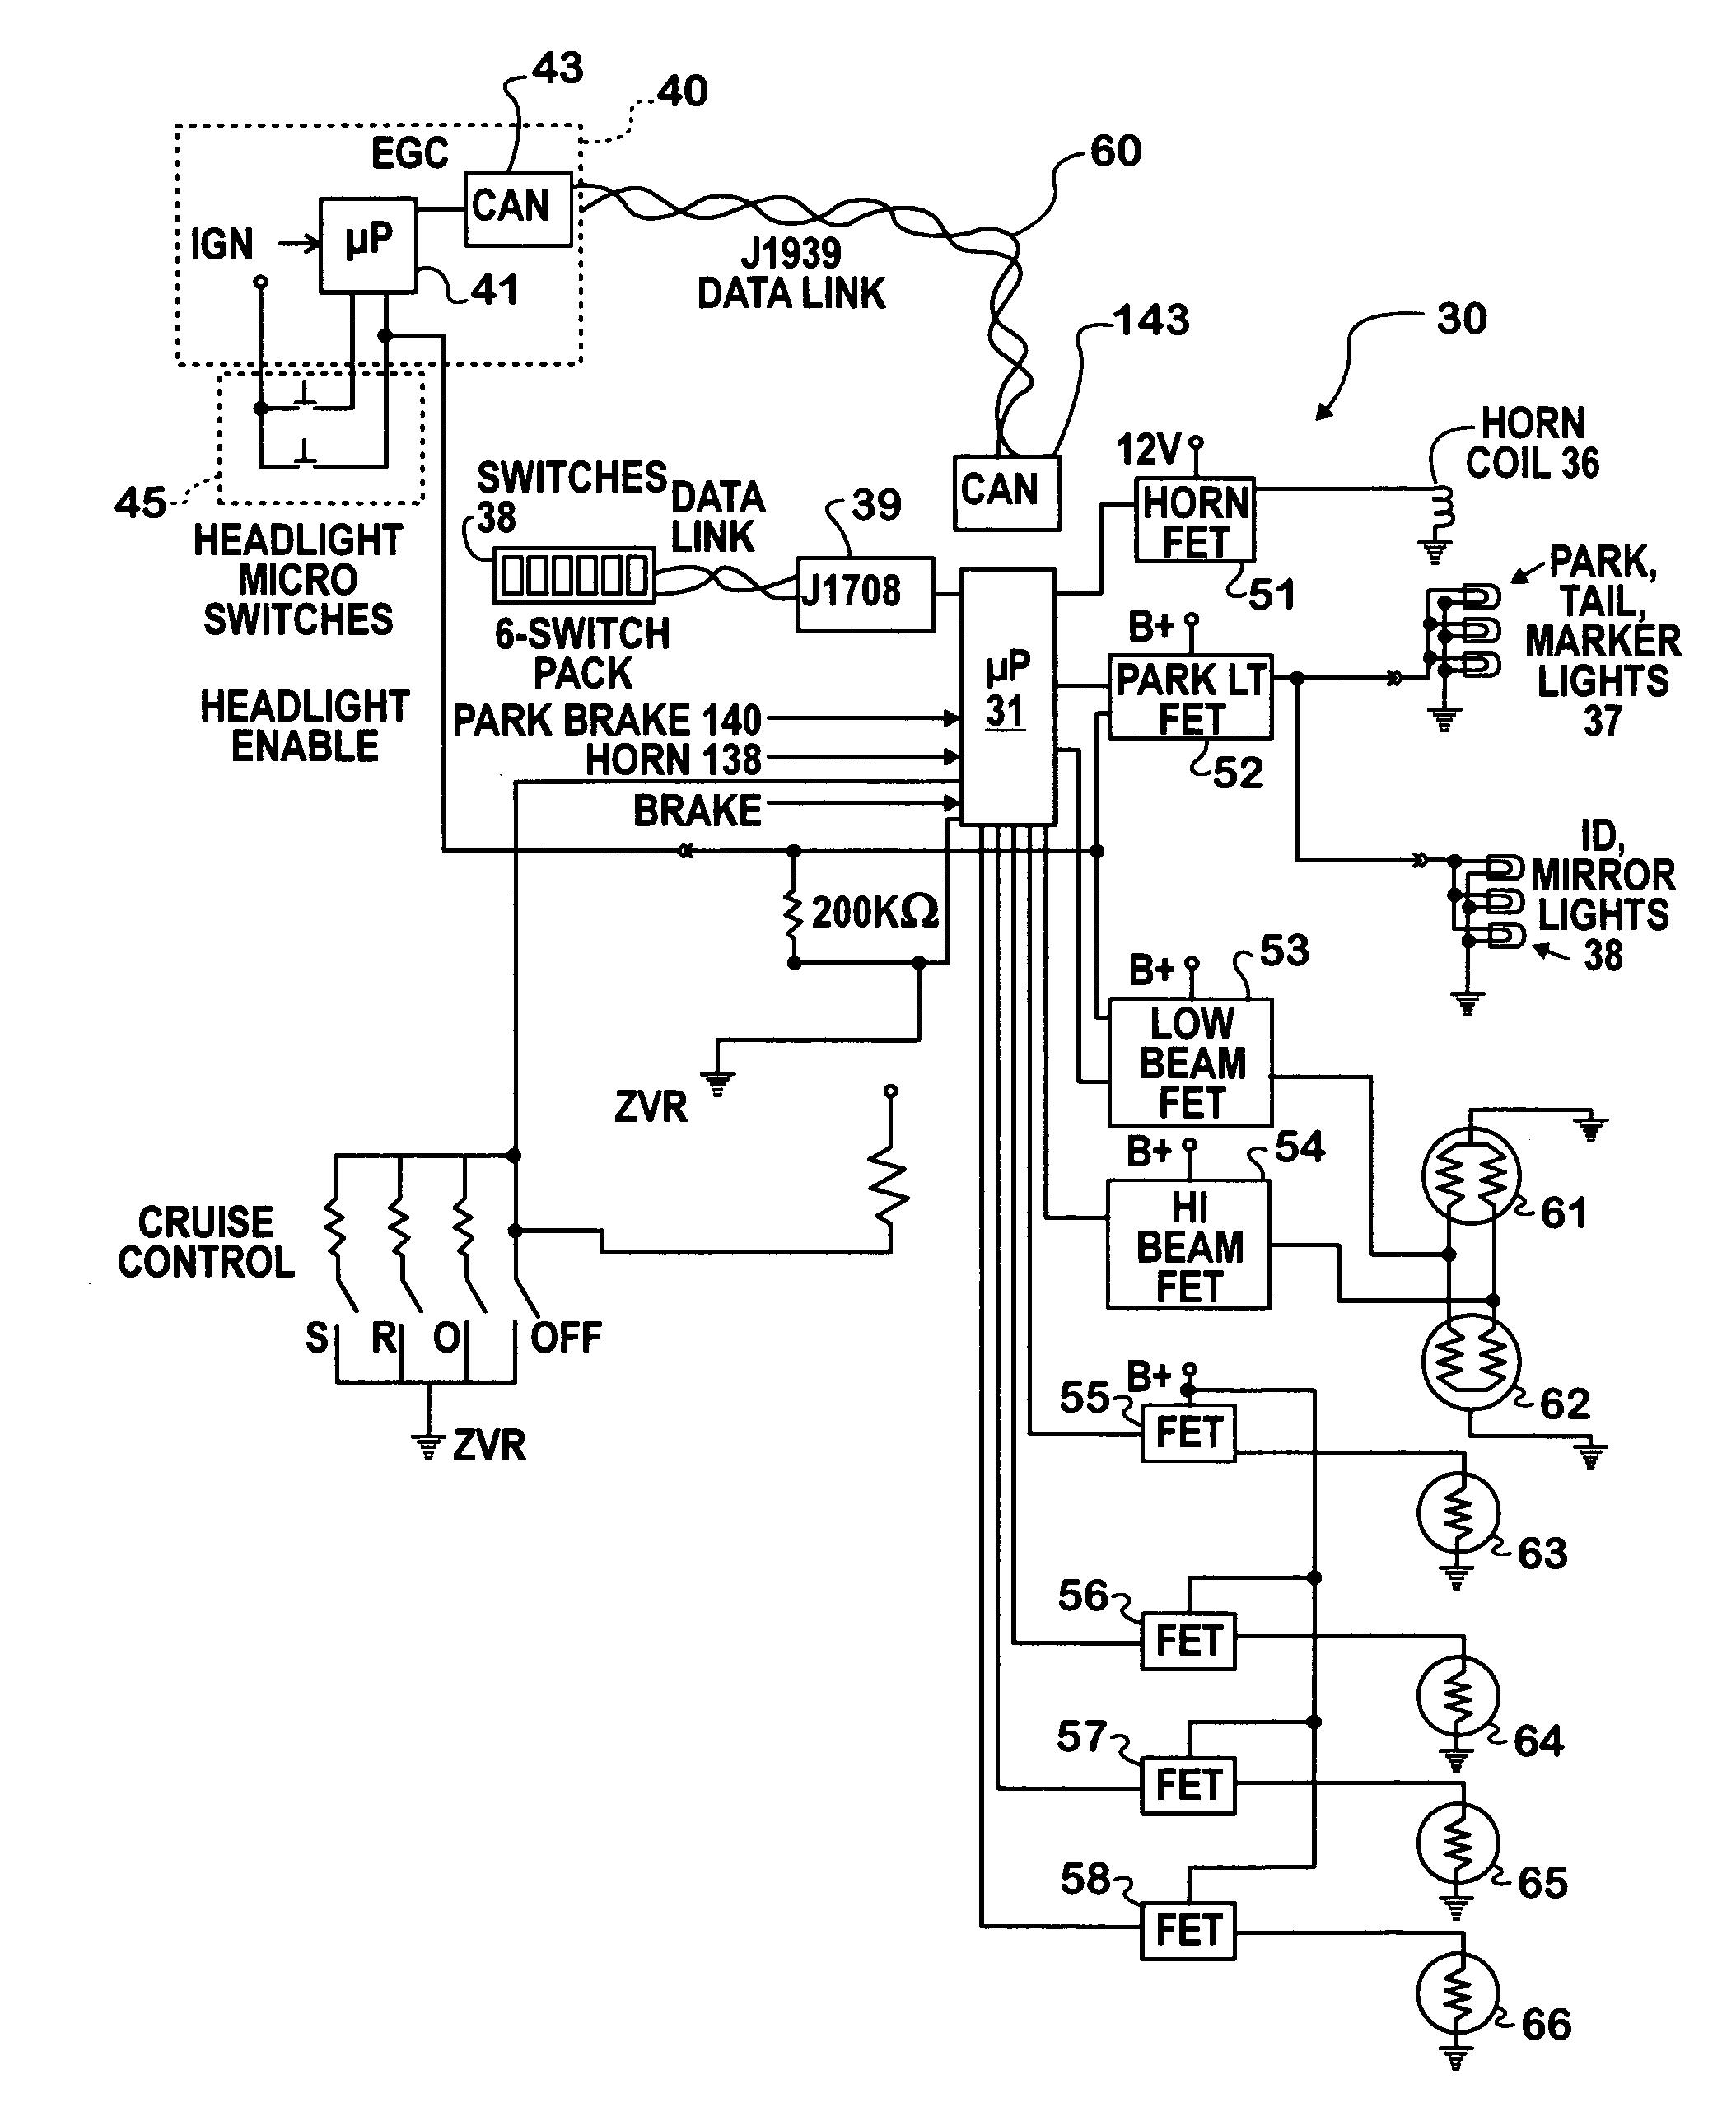 Navistar wiring diagram